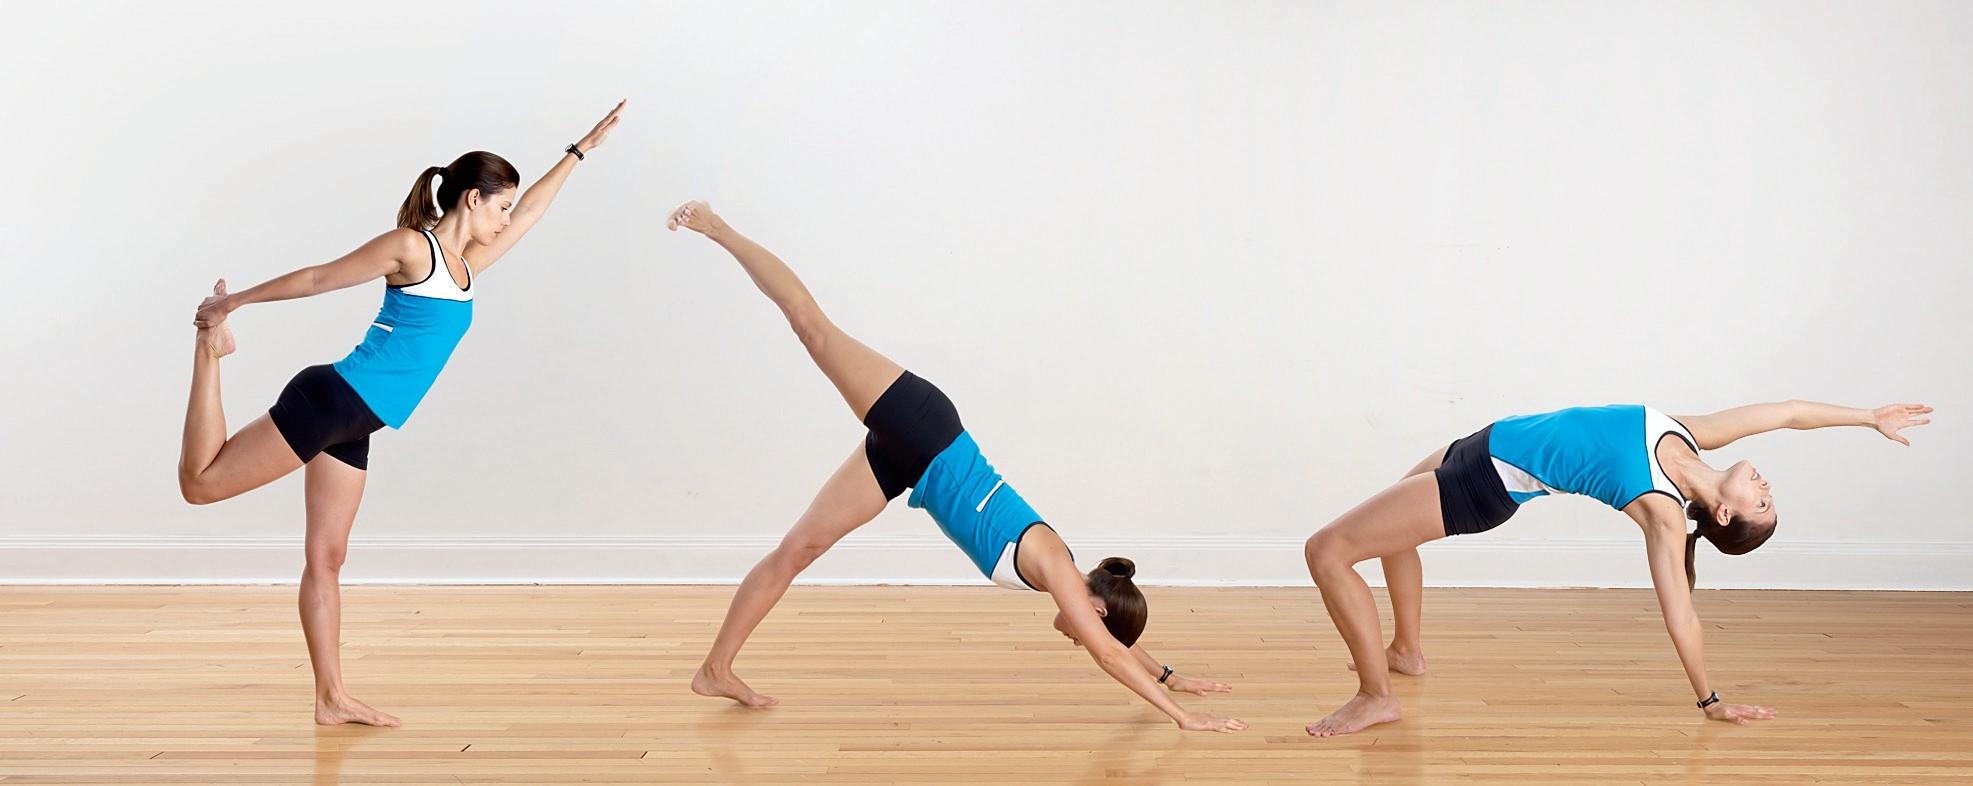 Etirez vos jambes grâce au yoga - Runner's World